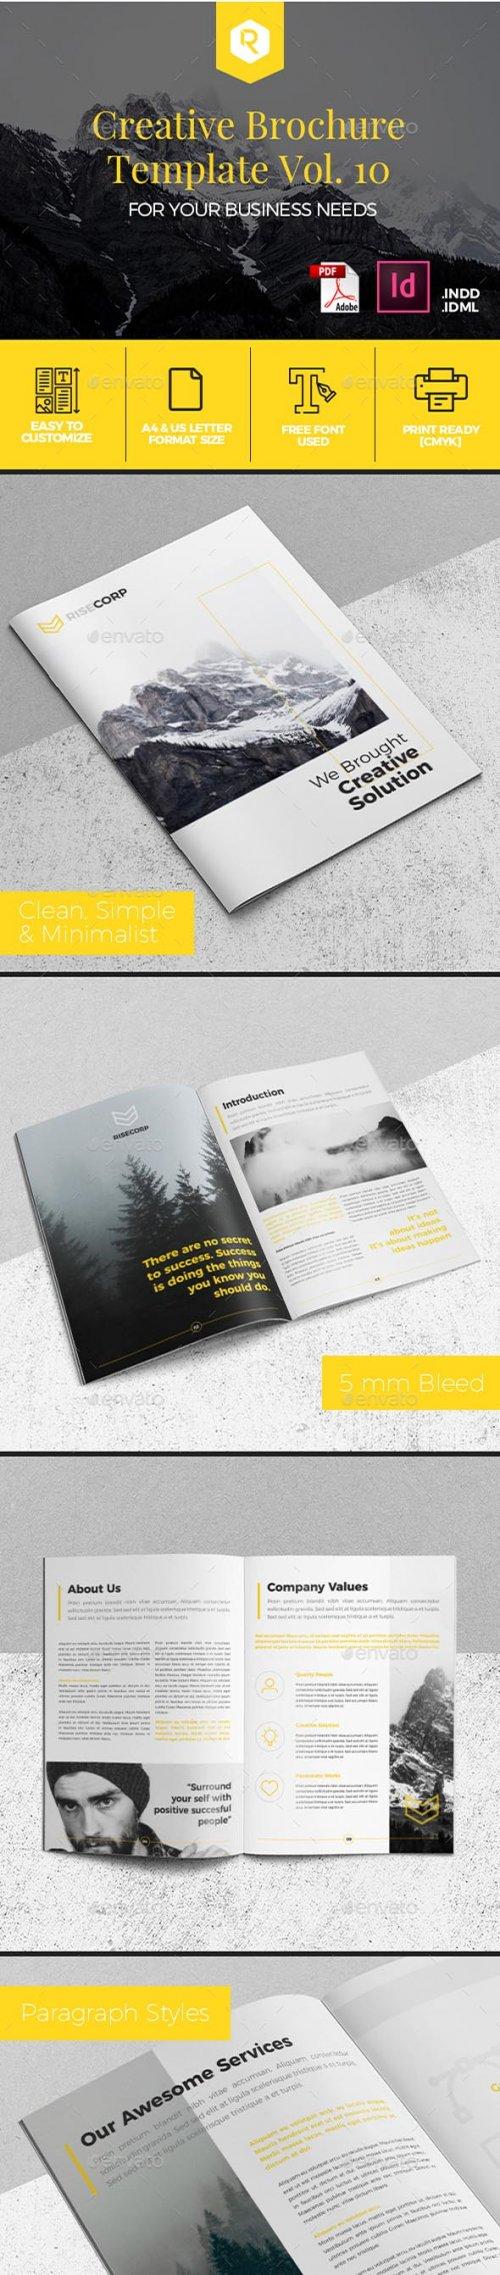 GR - Creative Brochure Template Vol. 10 19949253